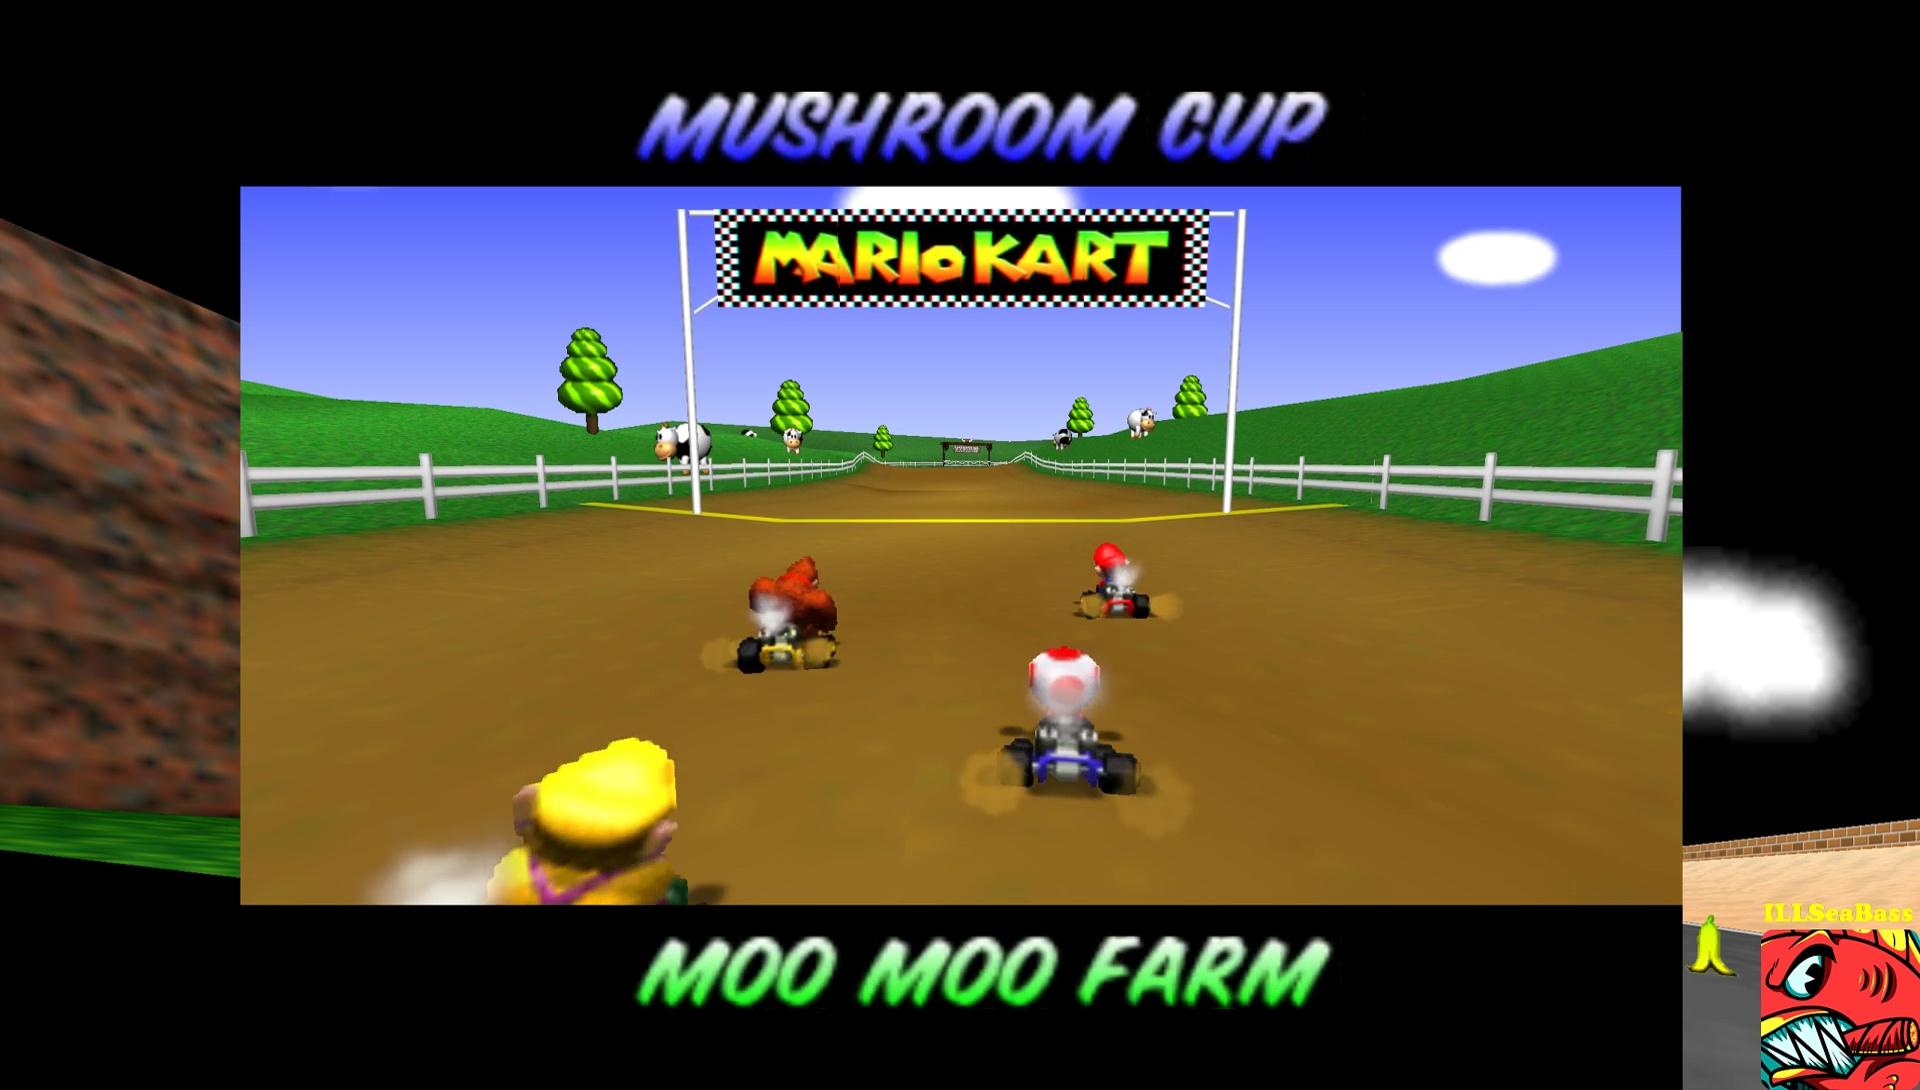 ILLSeaBass: Mario Kart 64: Moo Moo Farm [50cc] (N64 Emulated) 0:01:46.02 points on 2017-05-29 12:41:01